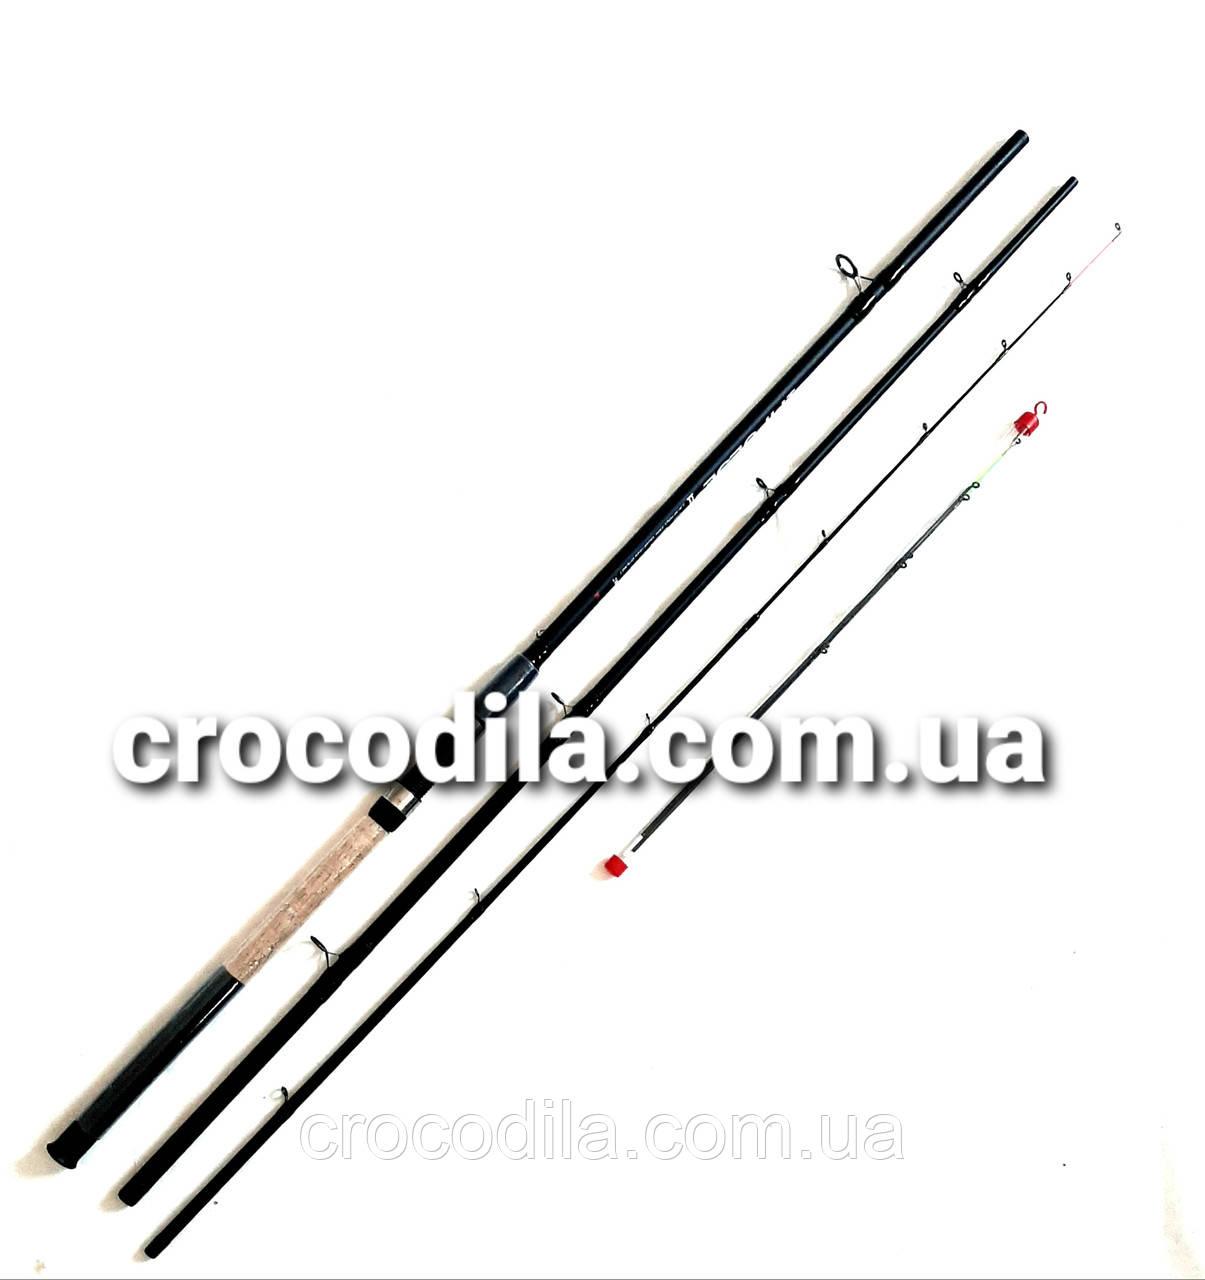 Фидерное удилище Kaida (Weida) Impulse II 3.9 m 60-160